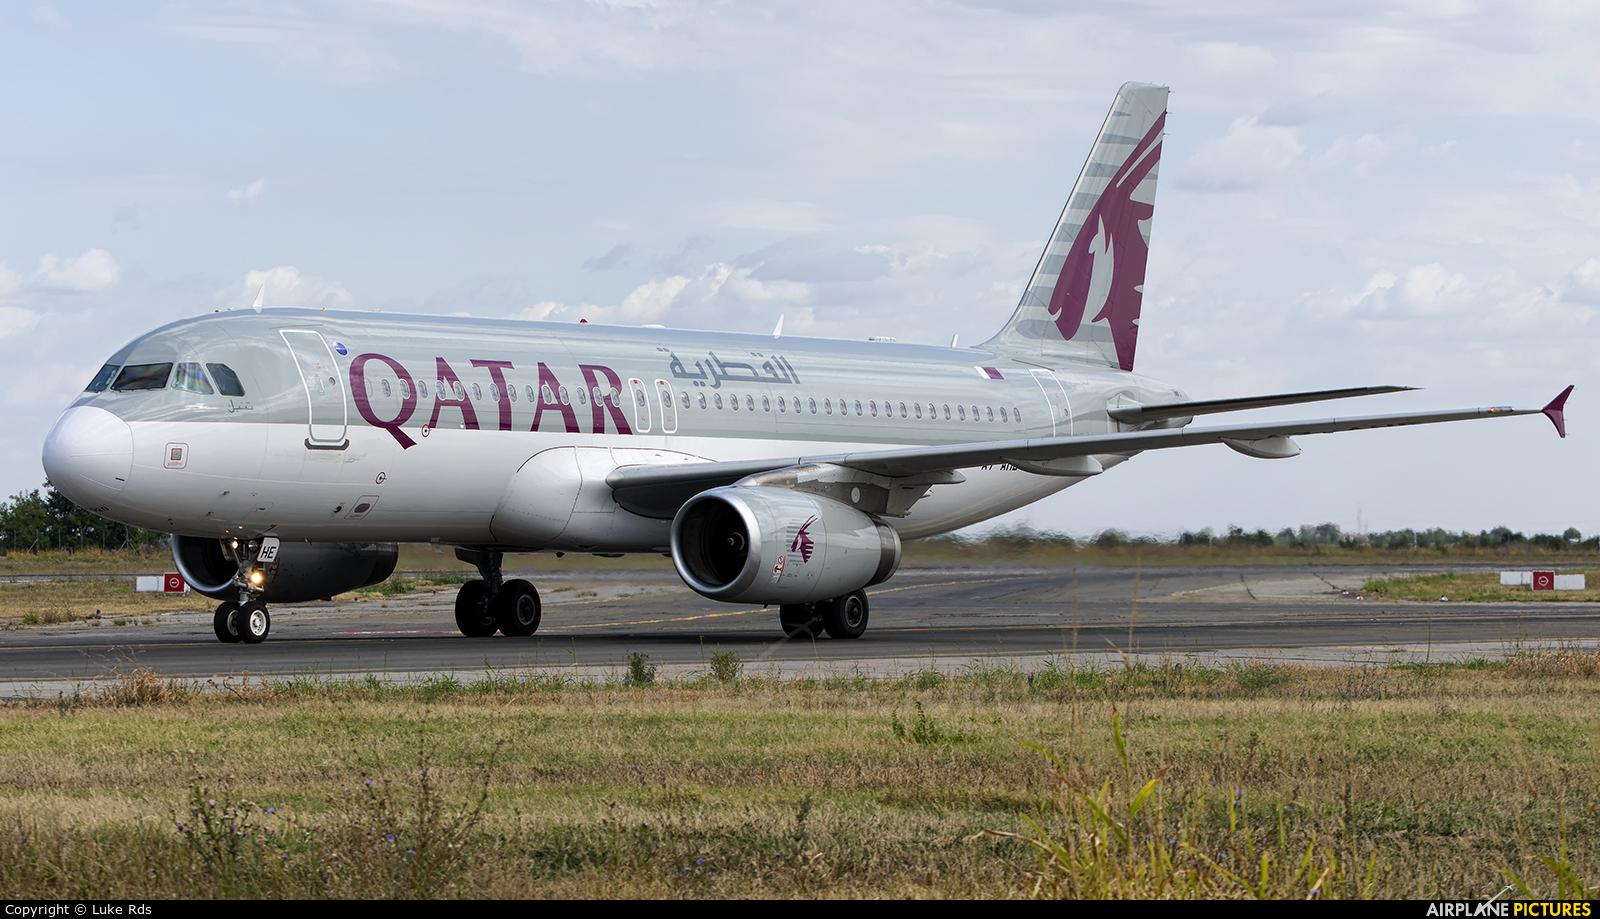 Qatar Airways A7-AHE aircraft at Bucharest - Henri Coandă